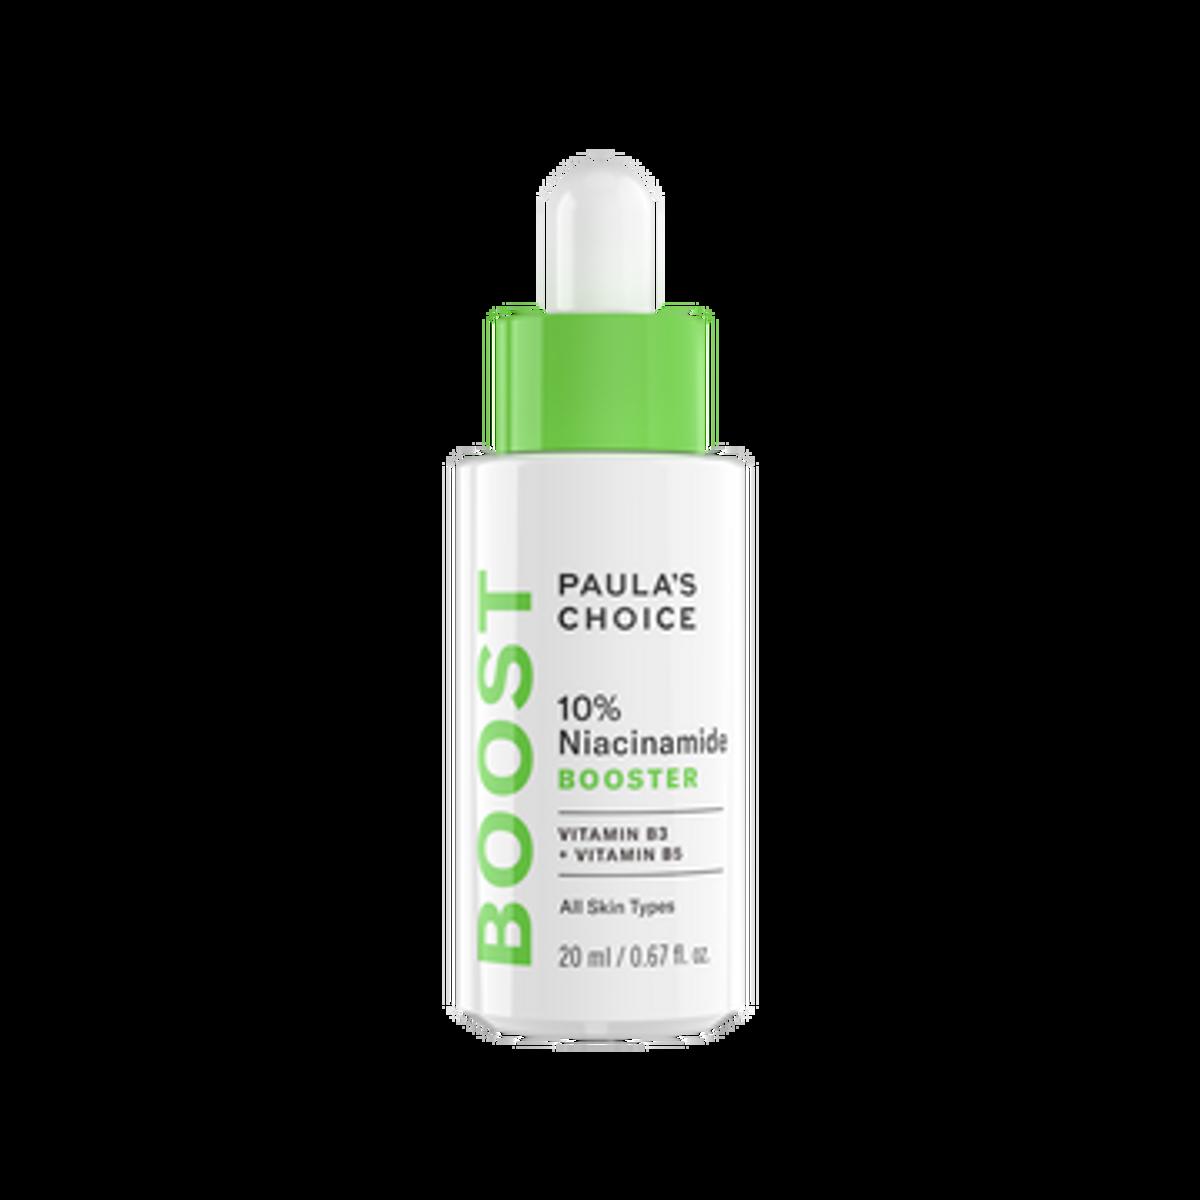 paulas choice skincare10 percent niacinamide booster